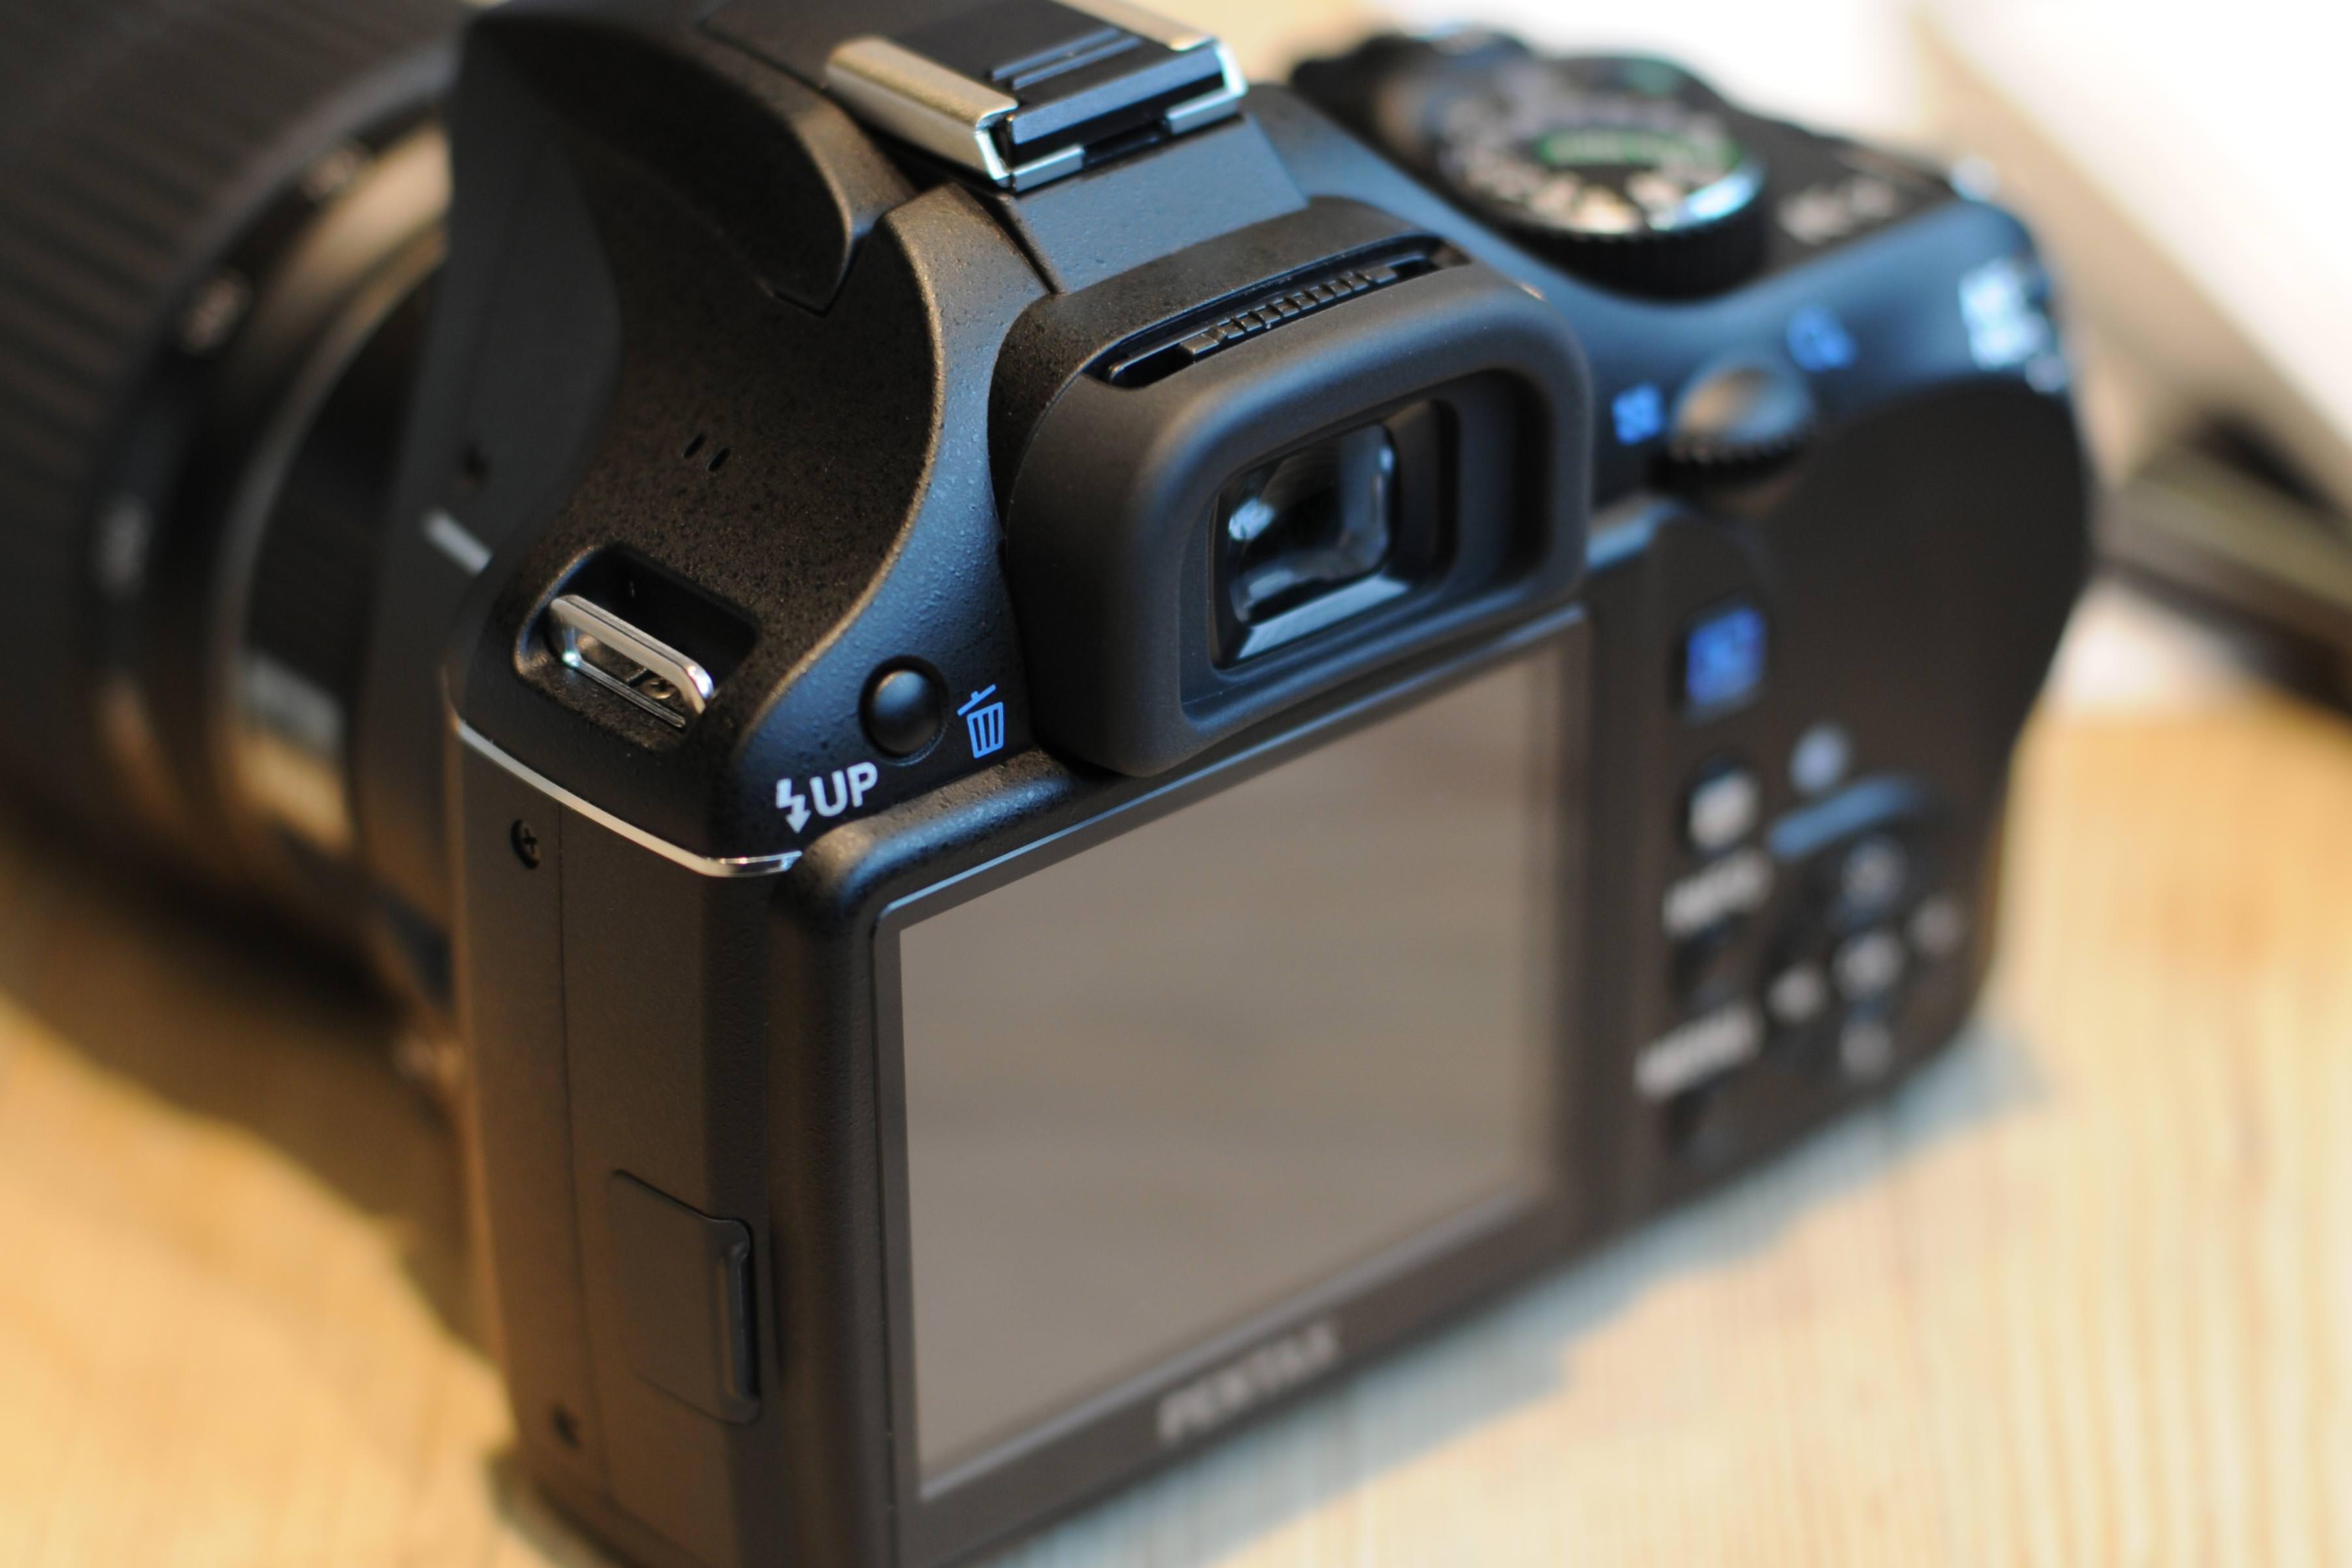 NEW 8Gb Genuine Patriot Memory Card for PENTAX K-7 Digital camera